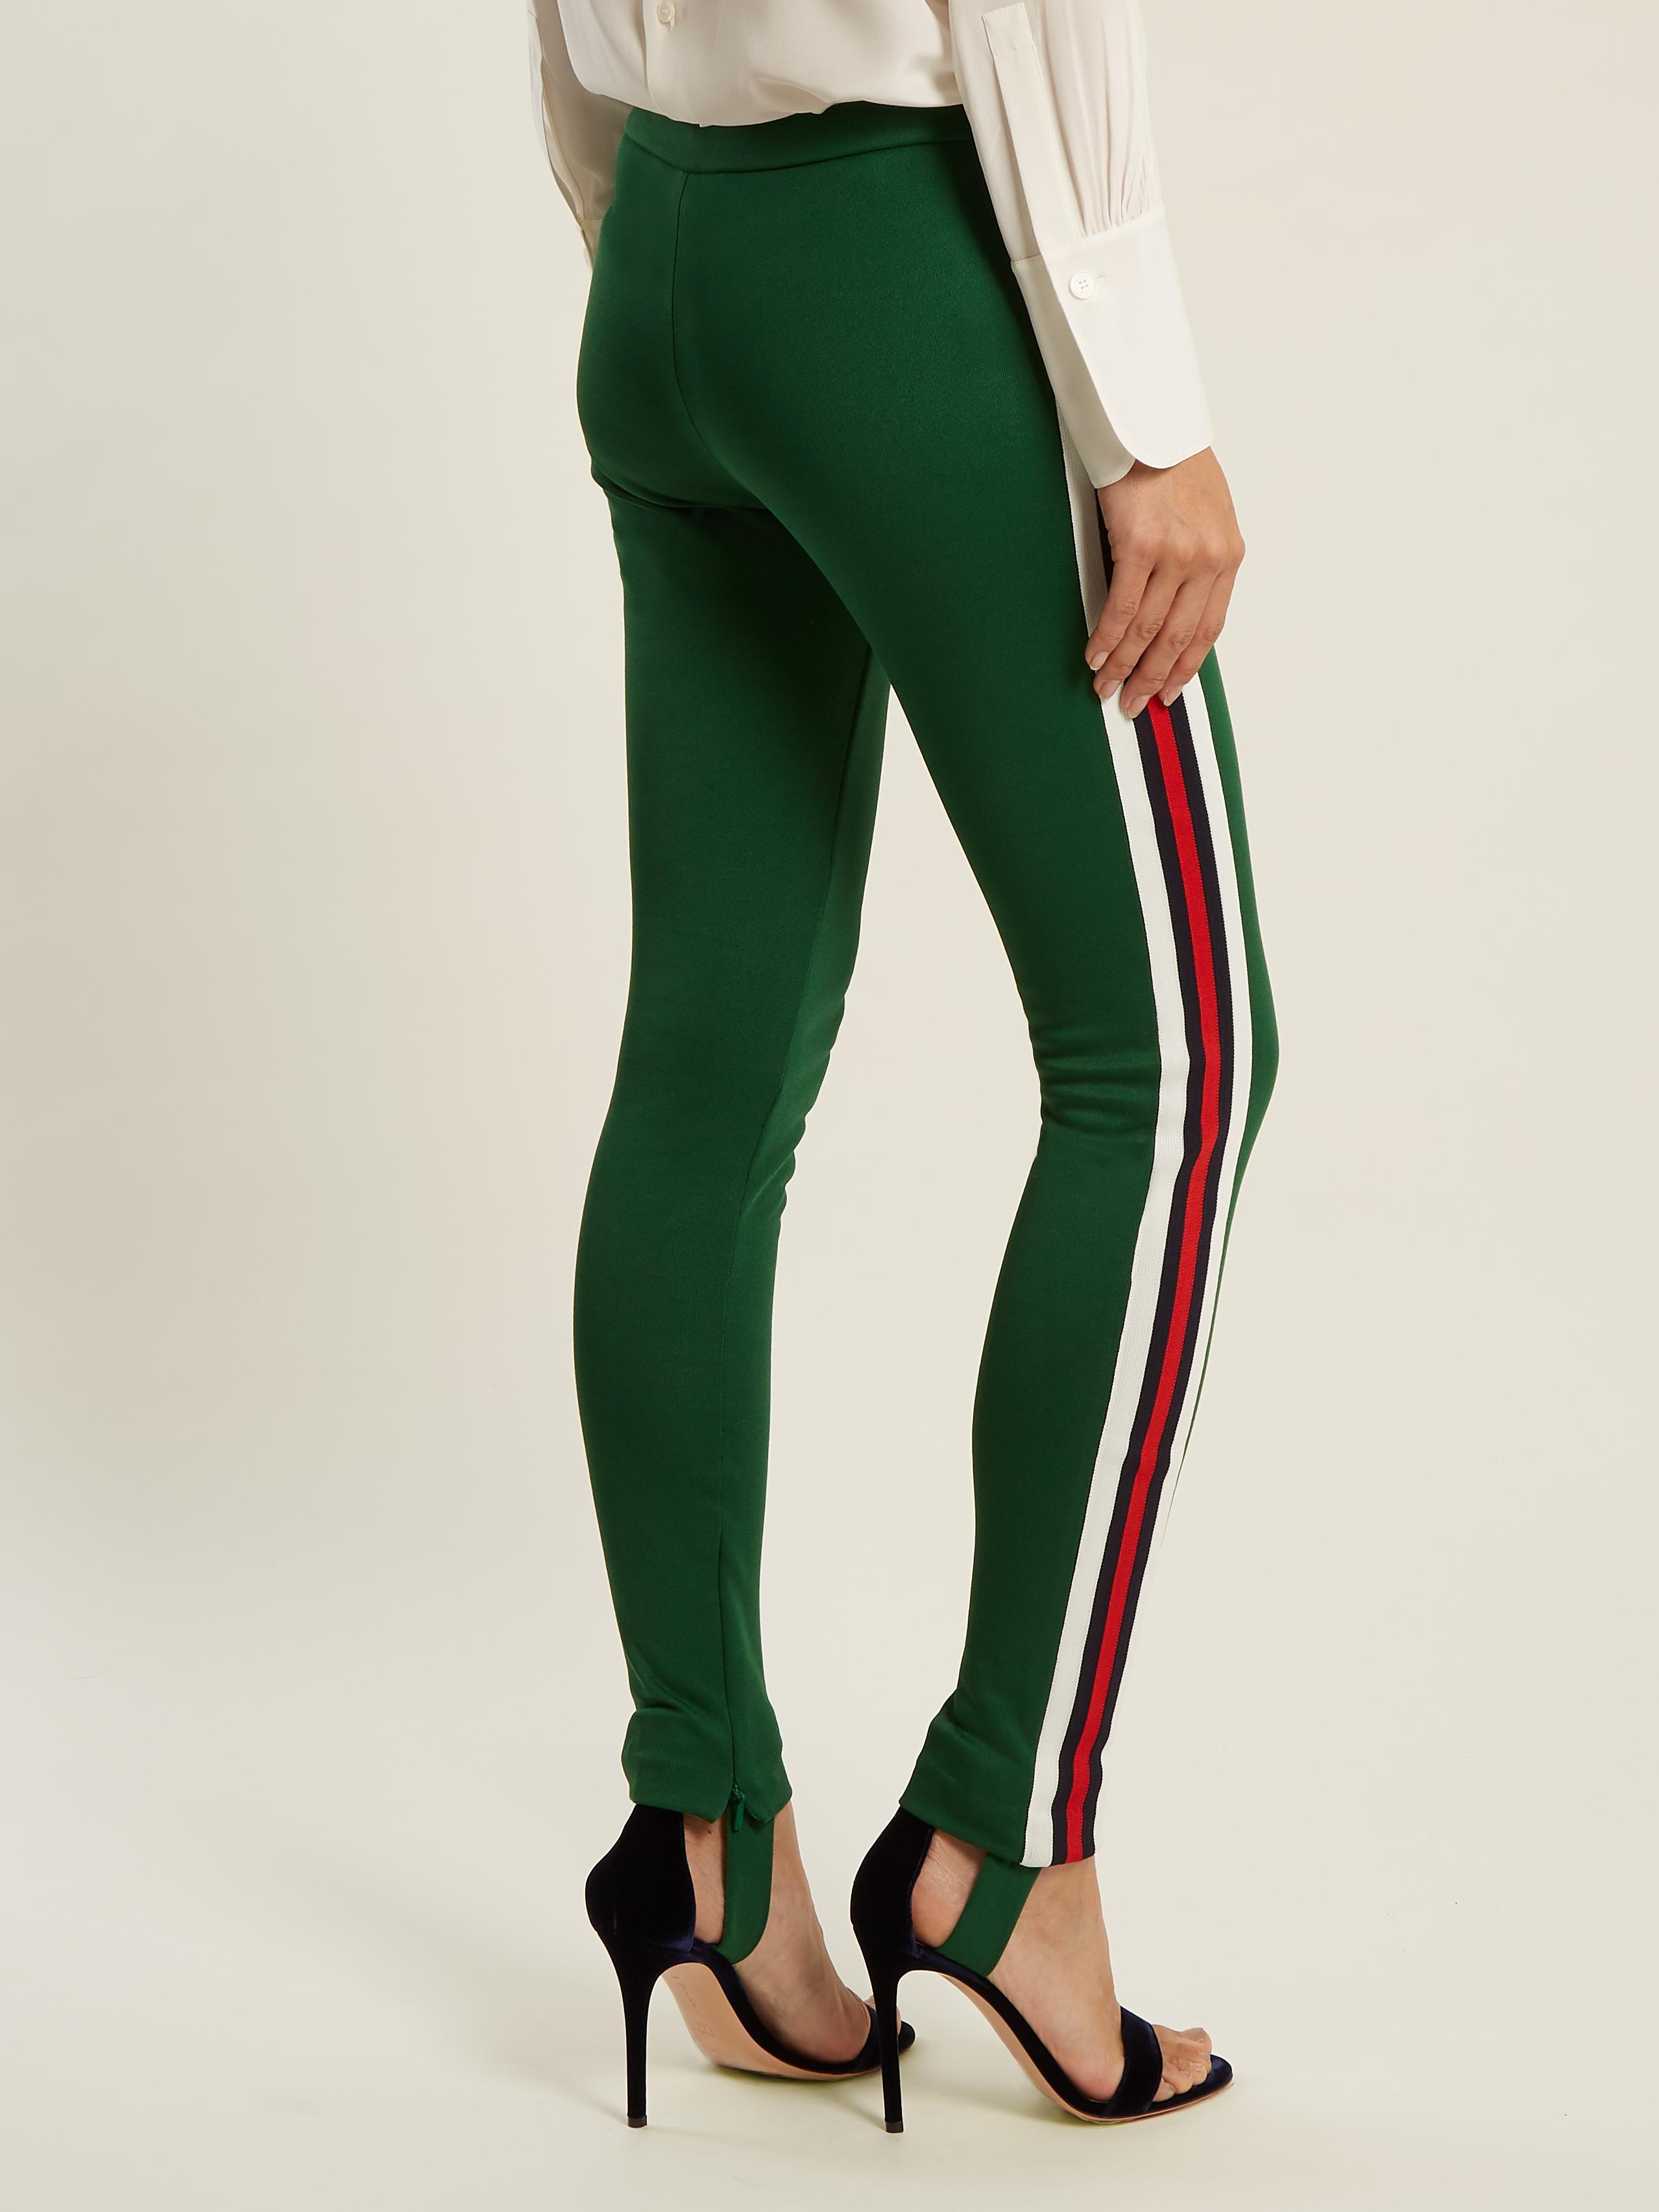 3f4dc0bbd Gucci Green Logo Tights